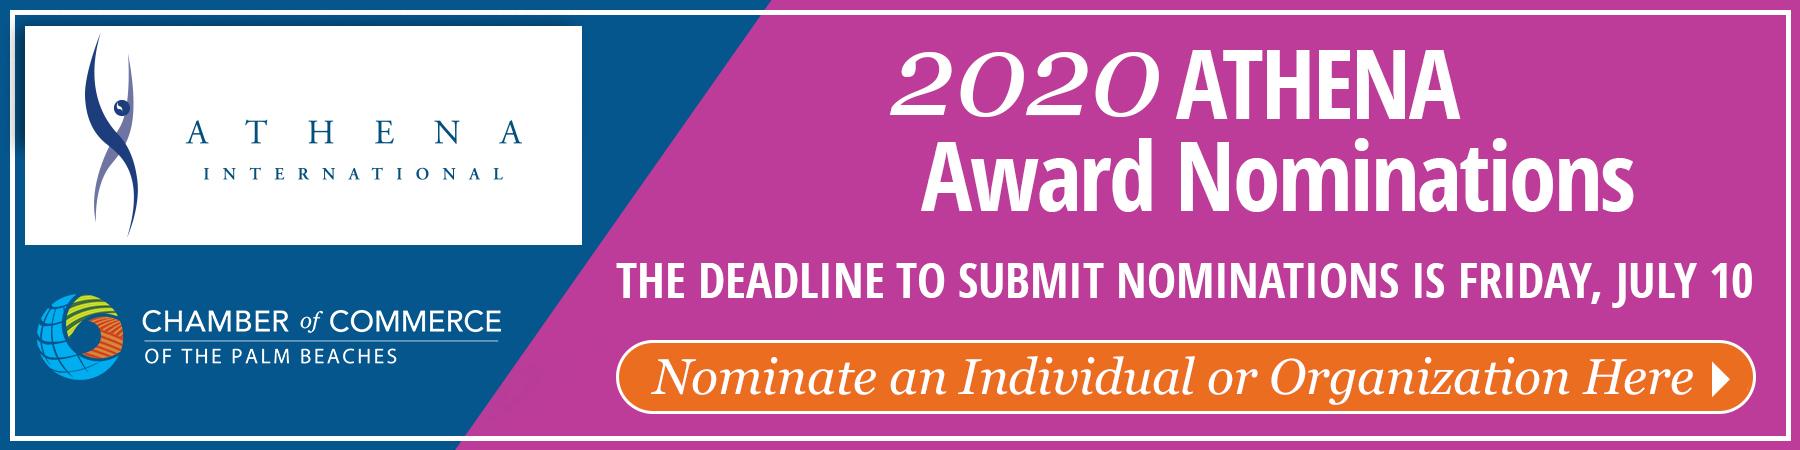 ATHENA_Nominations_WebBanner_6.2.2020